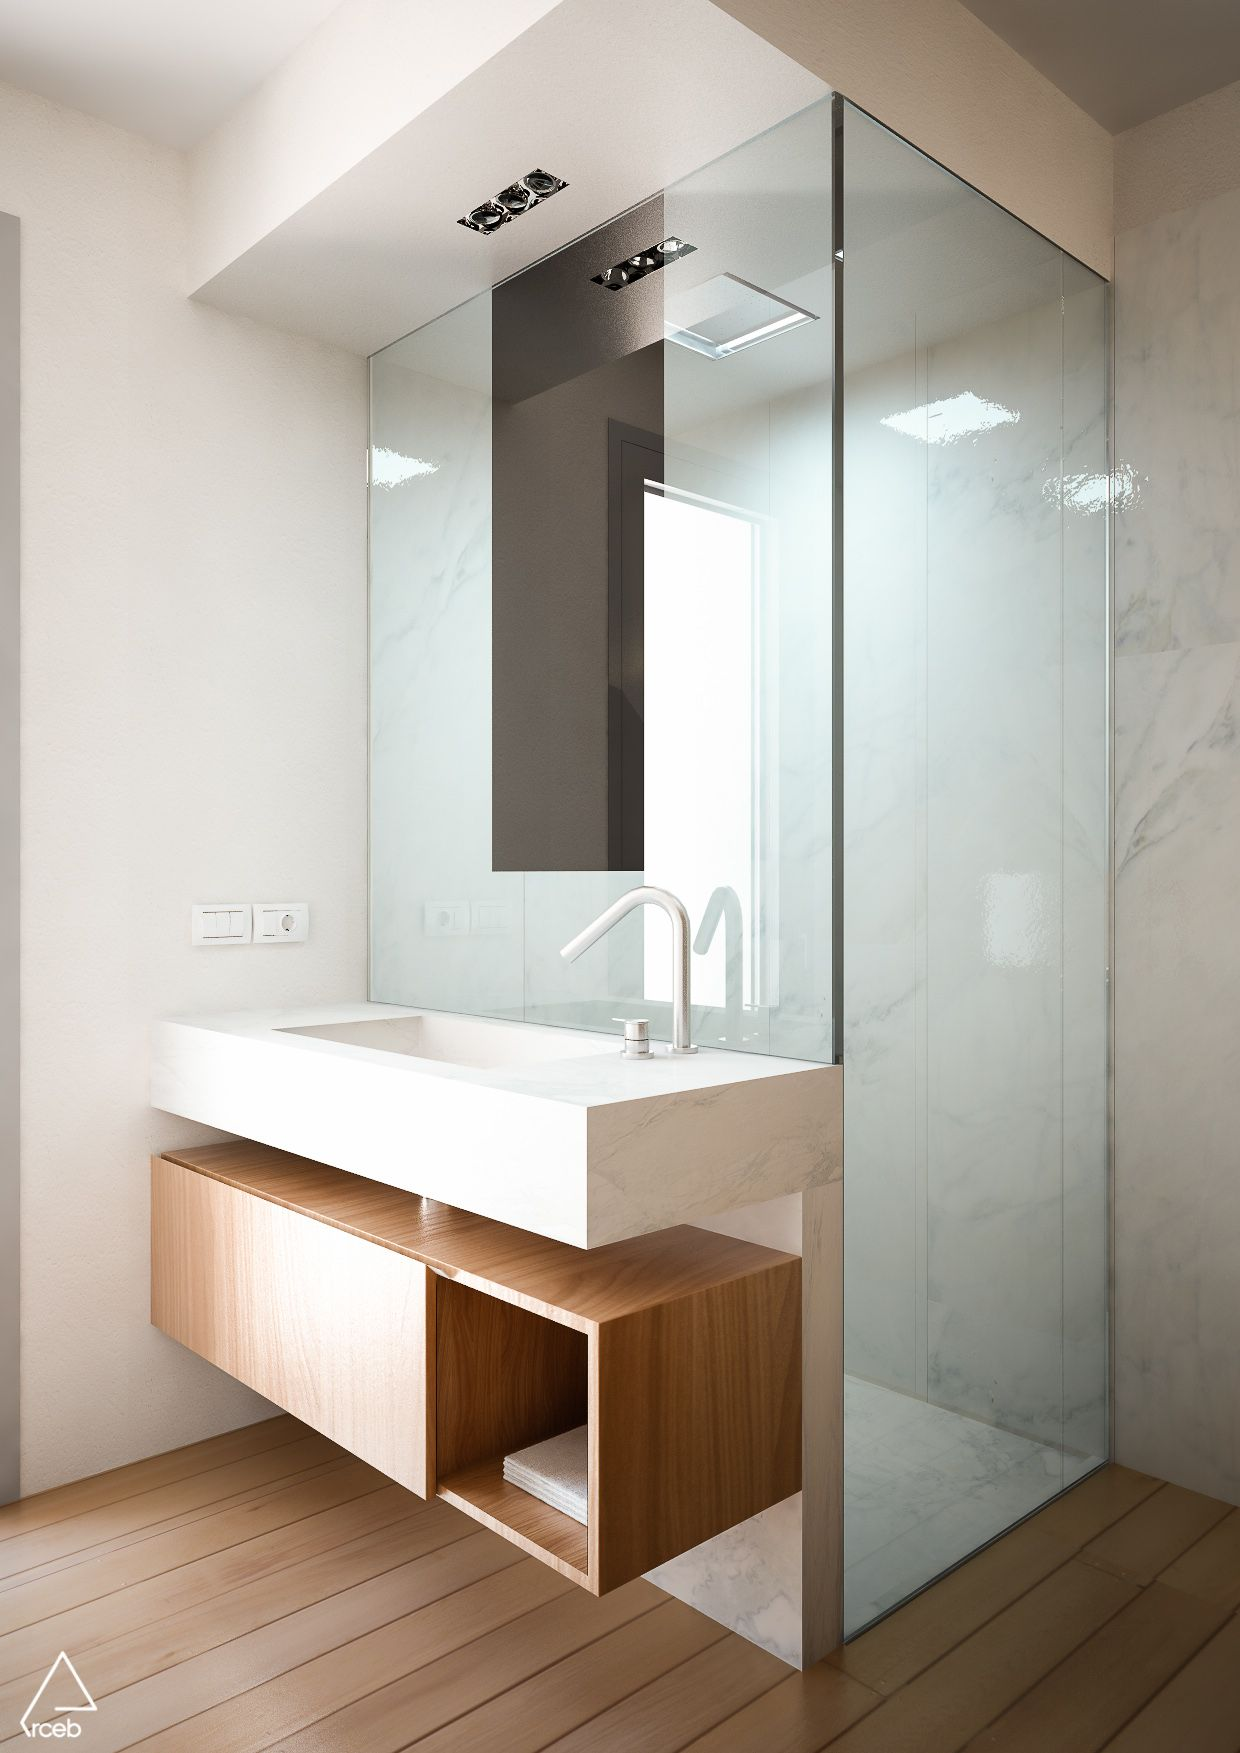 COCOON Bathroom Design Inspiration Modern Highend Stainless Steel